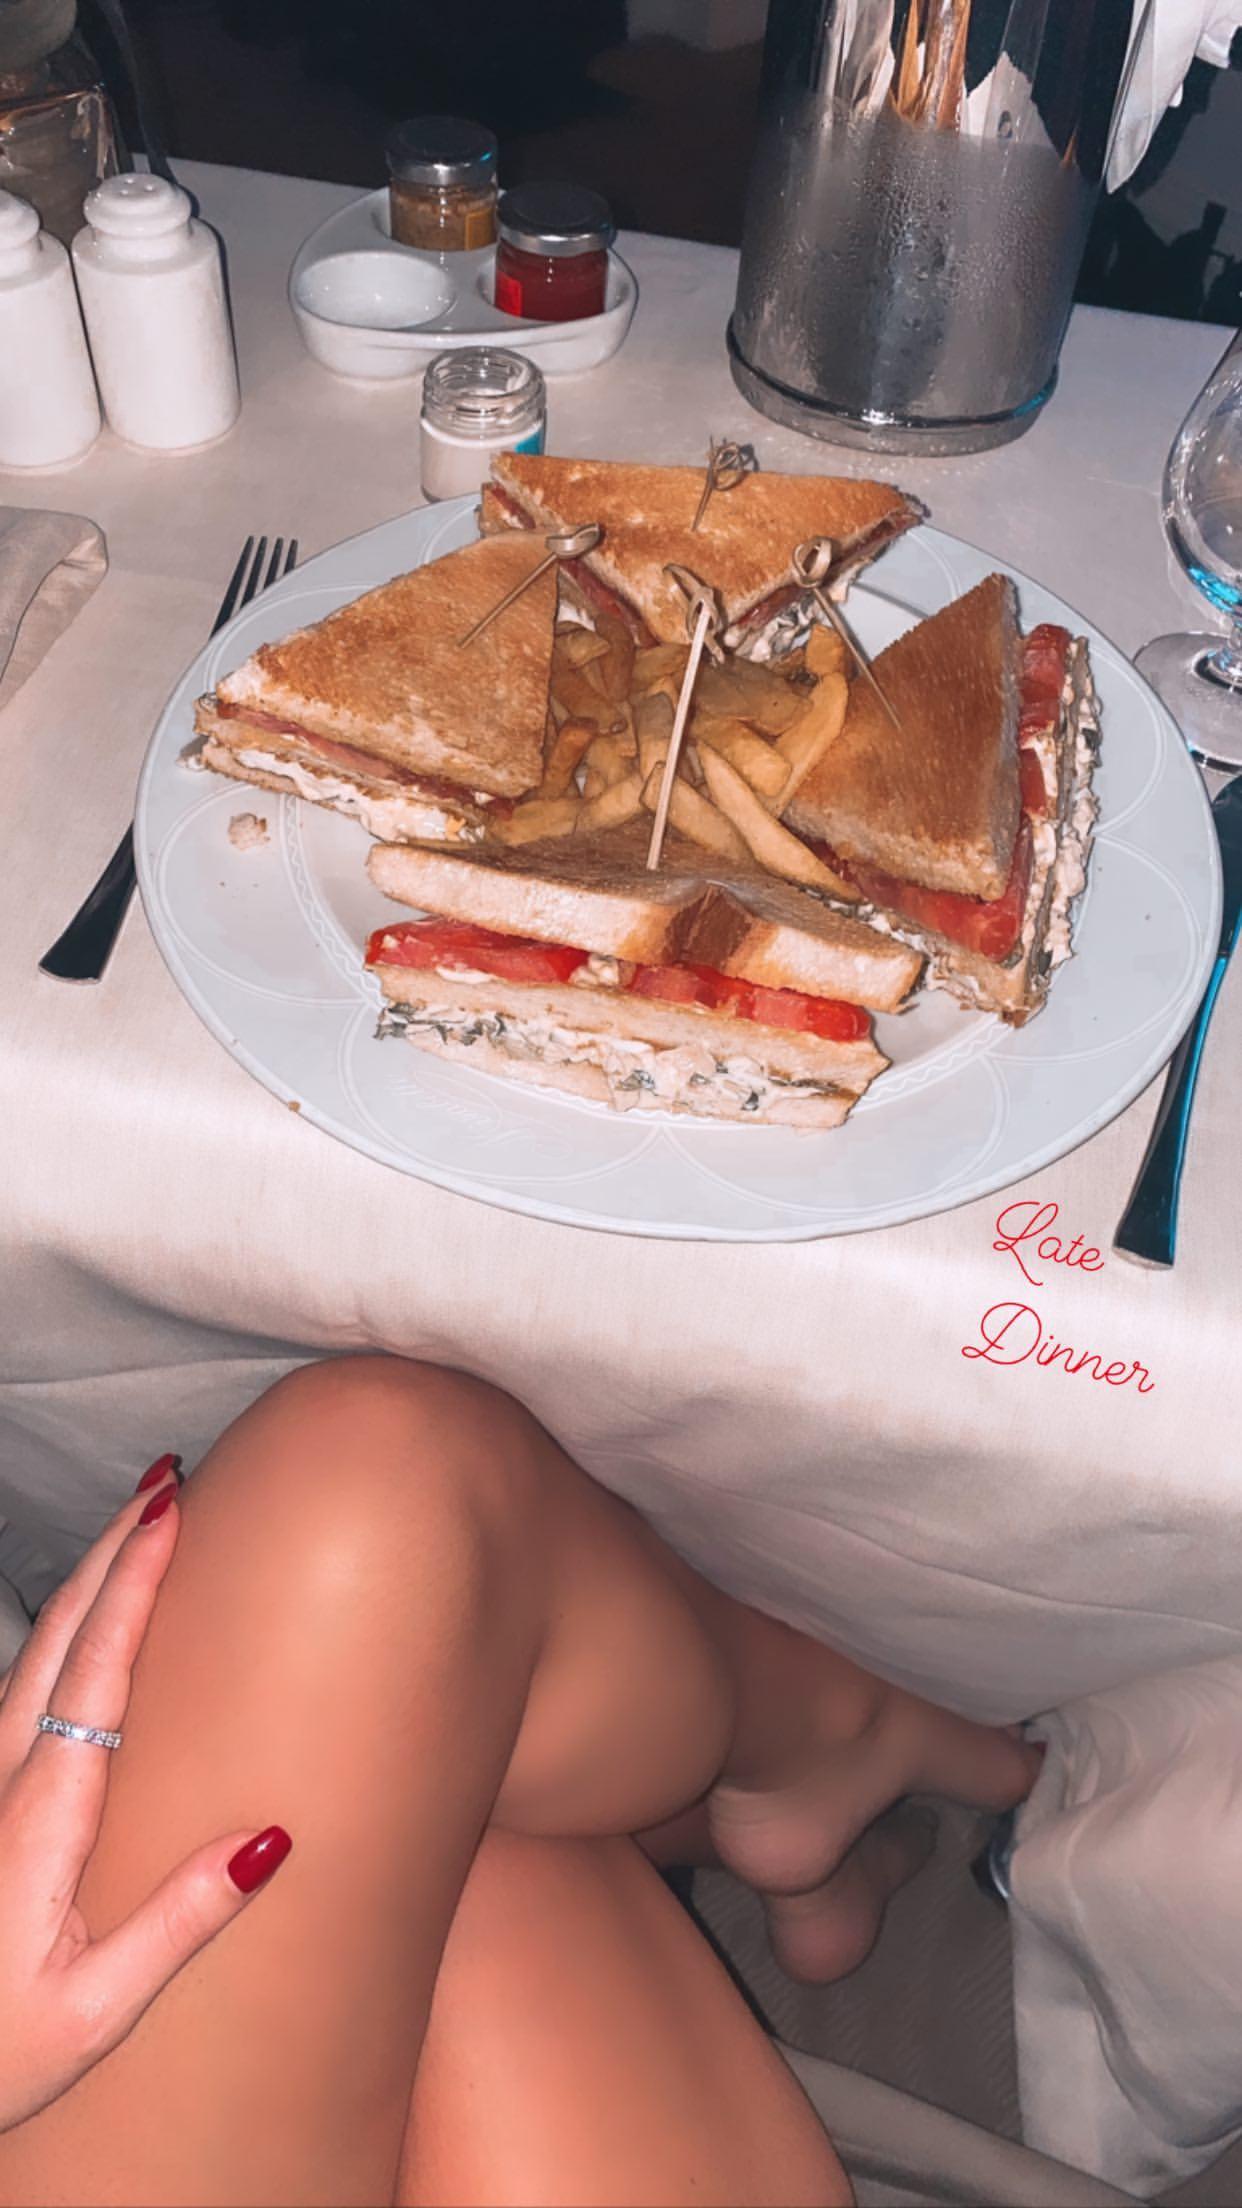 Gambe Diletta Leotta_Instagram